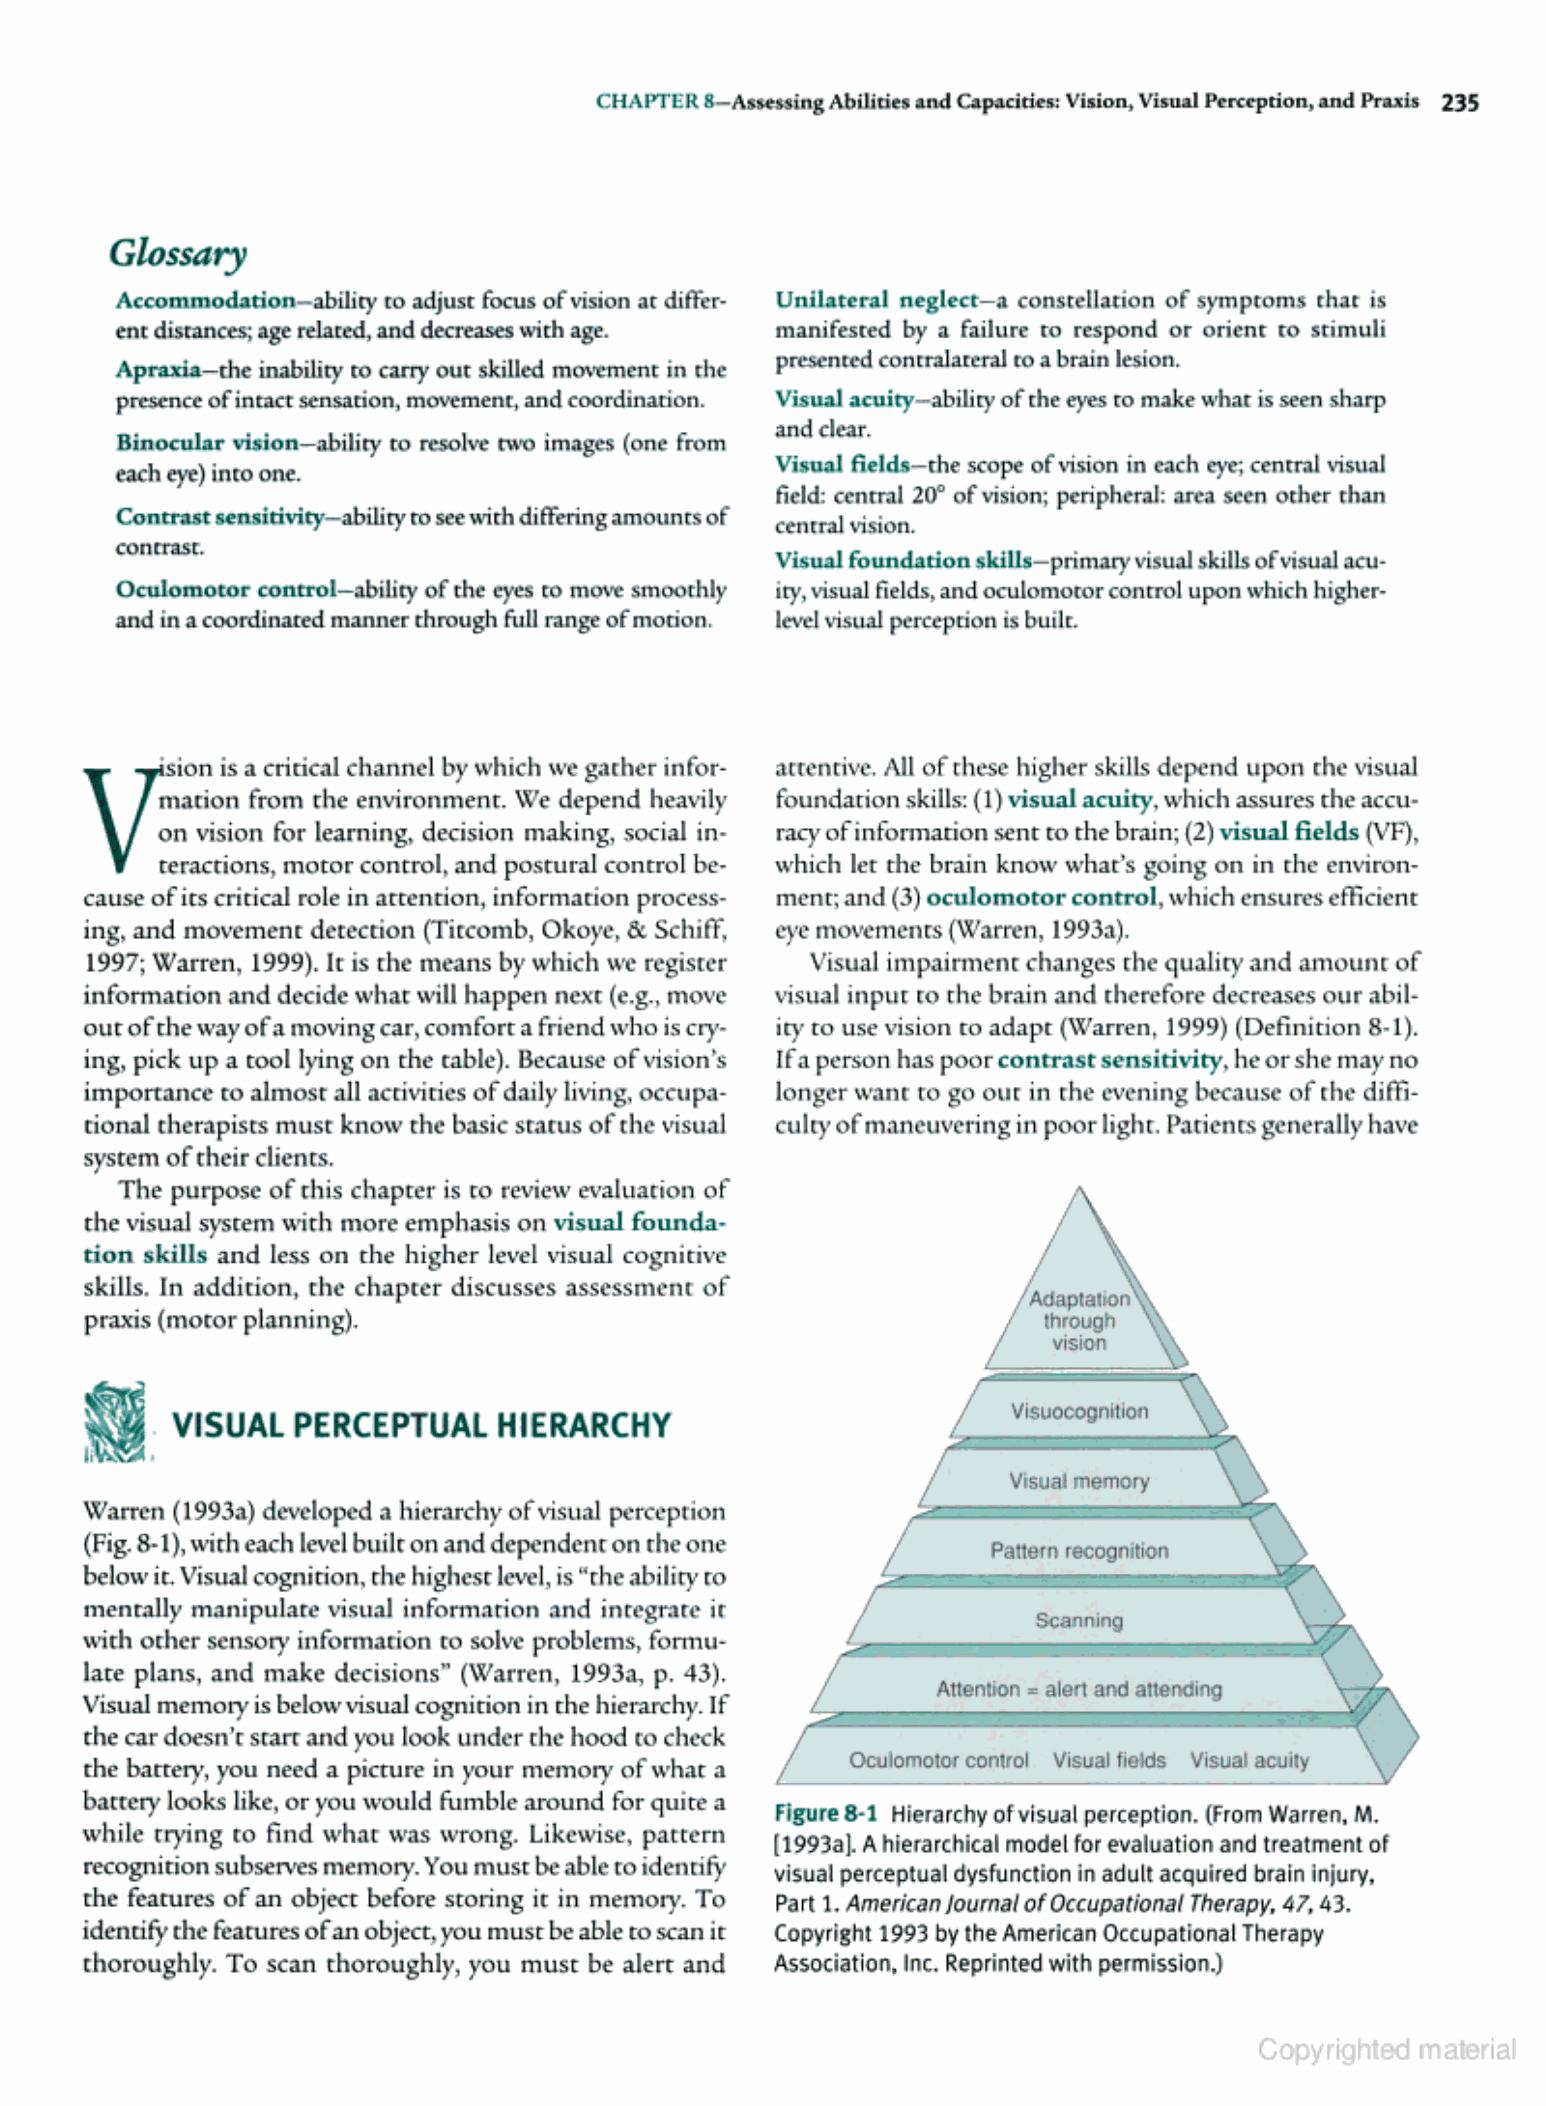 Hierarchy Of Visual Perceptual Skills Need Oculomotor Control Visual Fields And Visual Acuity